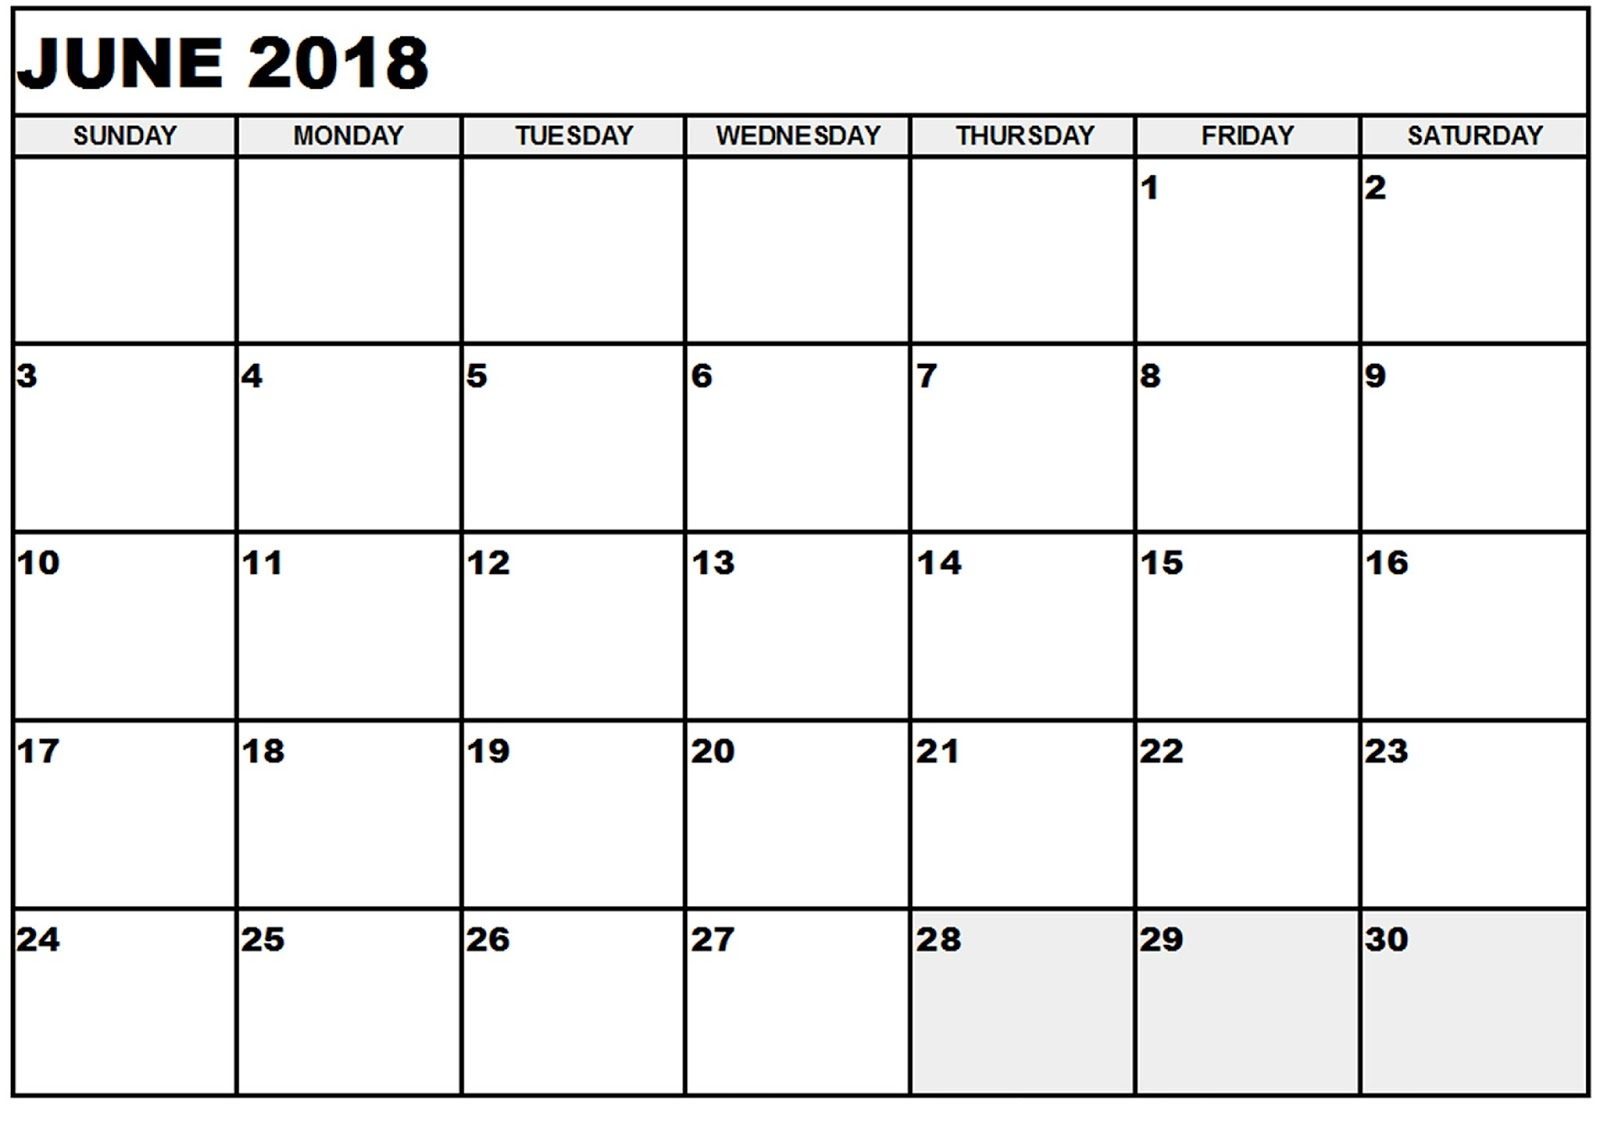 June 2018 Calendar Philippines Holidays And Events - July 2020 inside Calendar June Template Australia